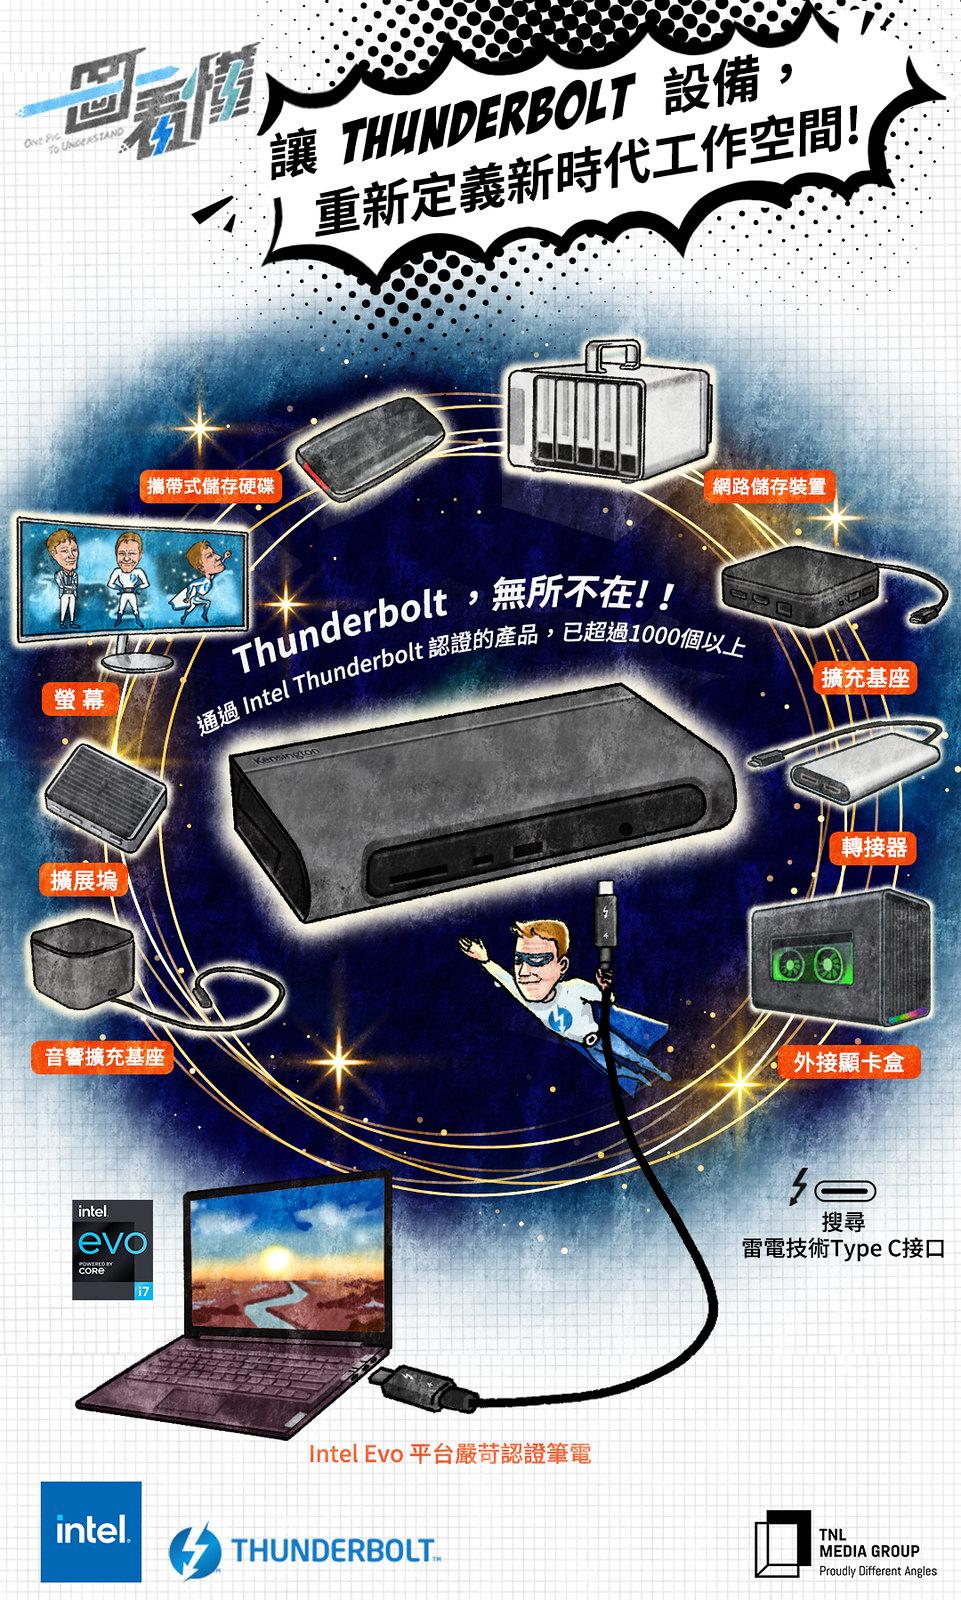 【Intel】Thunderbolt _3X Cool3c_繁中